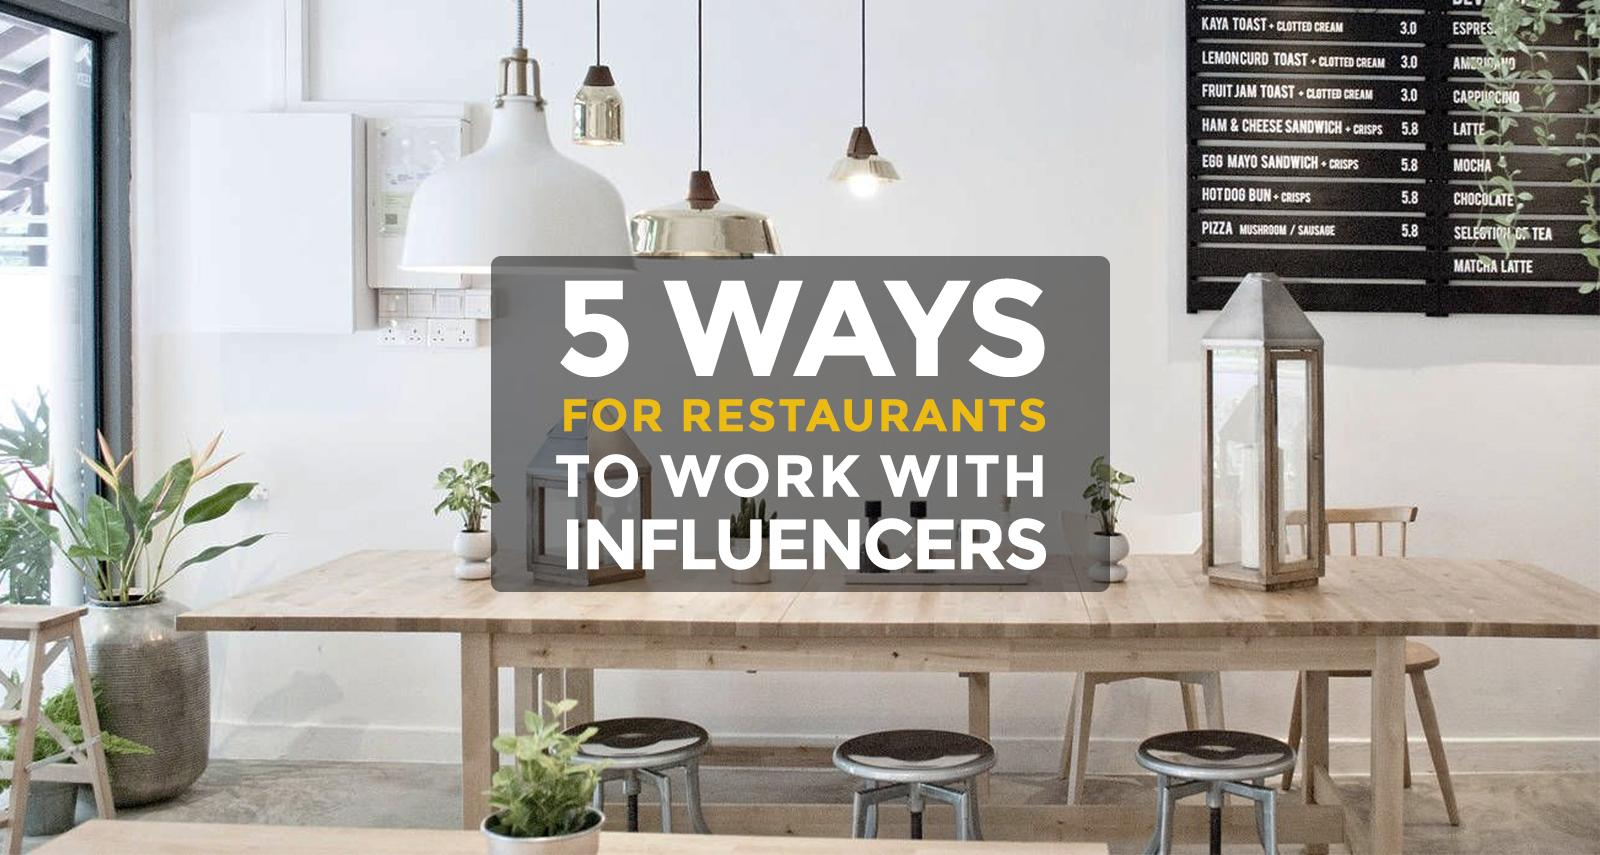 5 Influencer Marketing Ideas for Restaurants